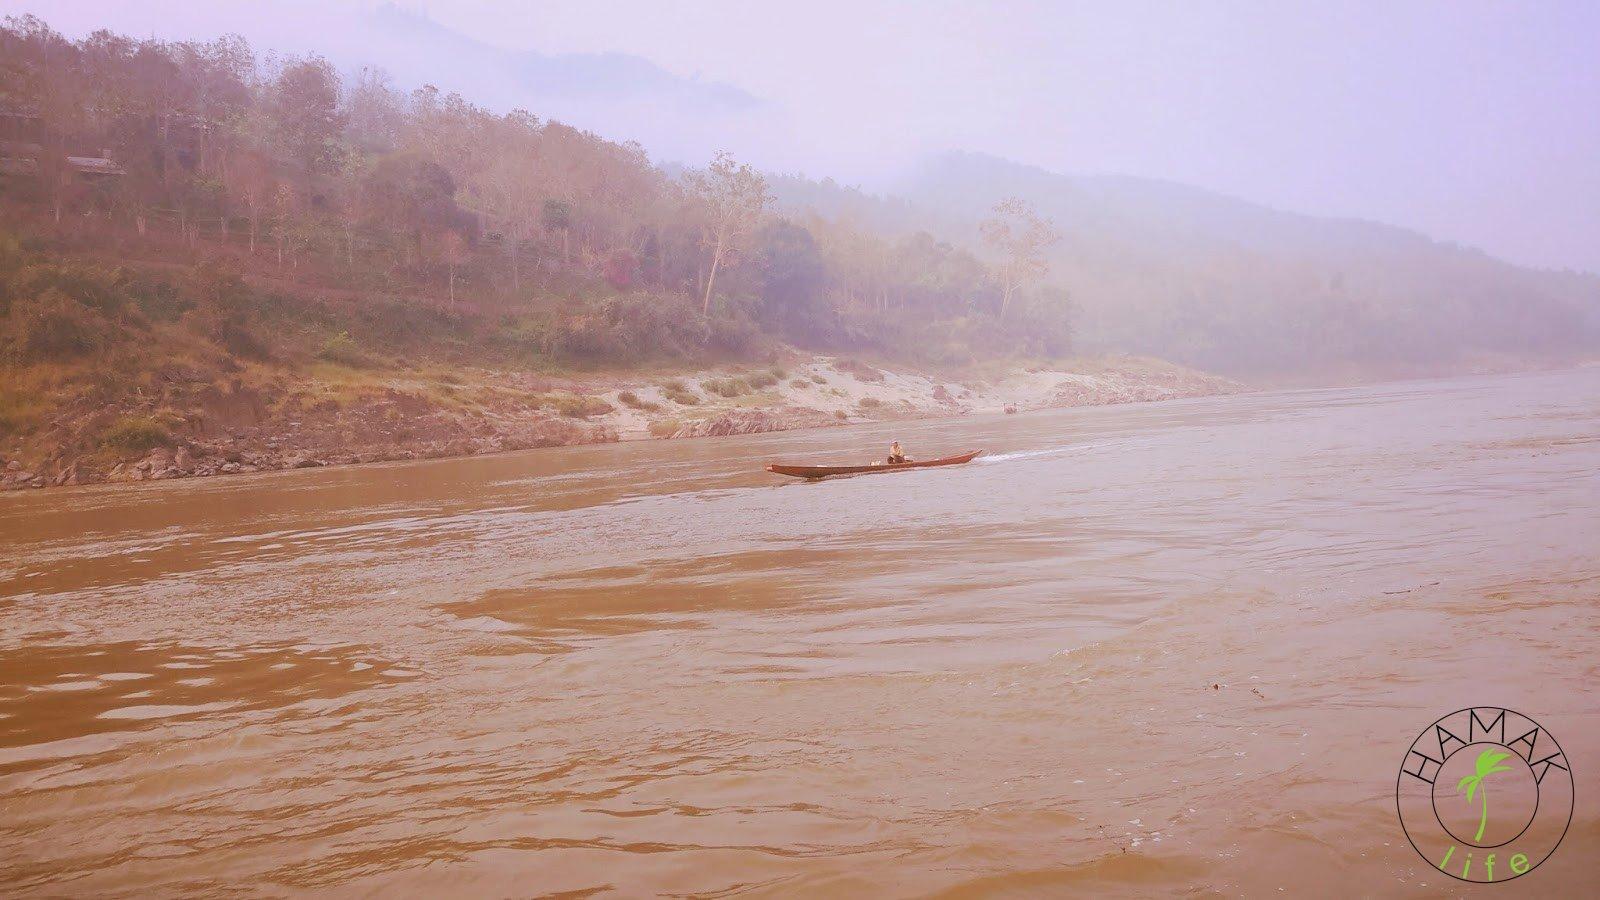 Mekong, Laos 2015